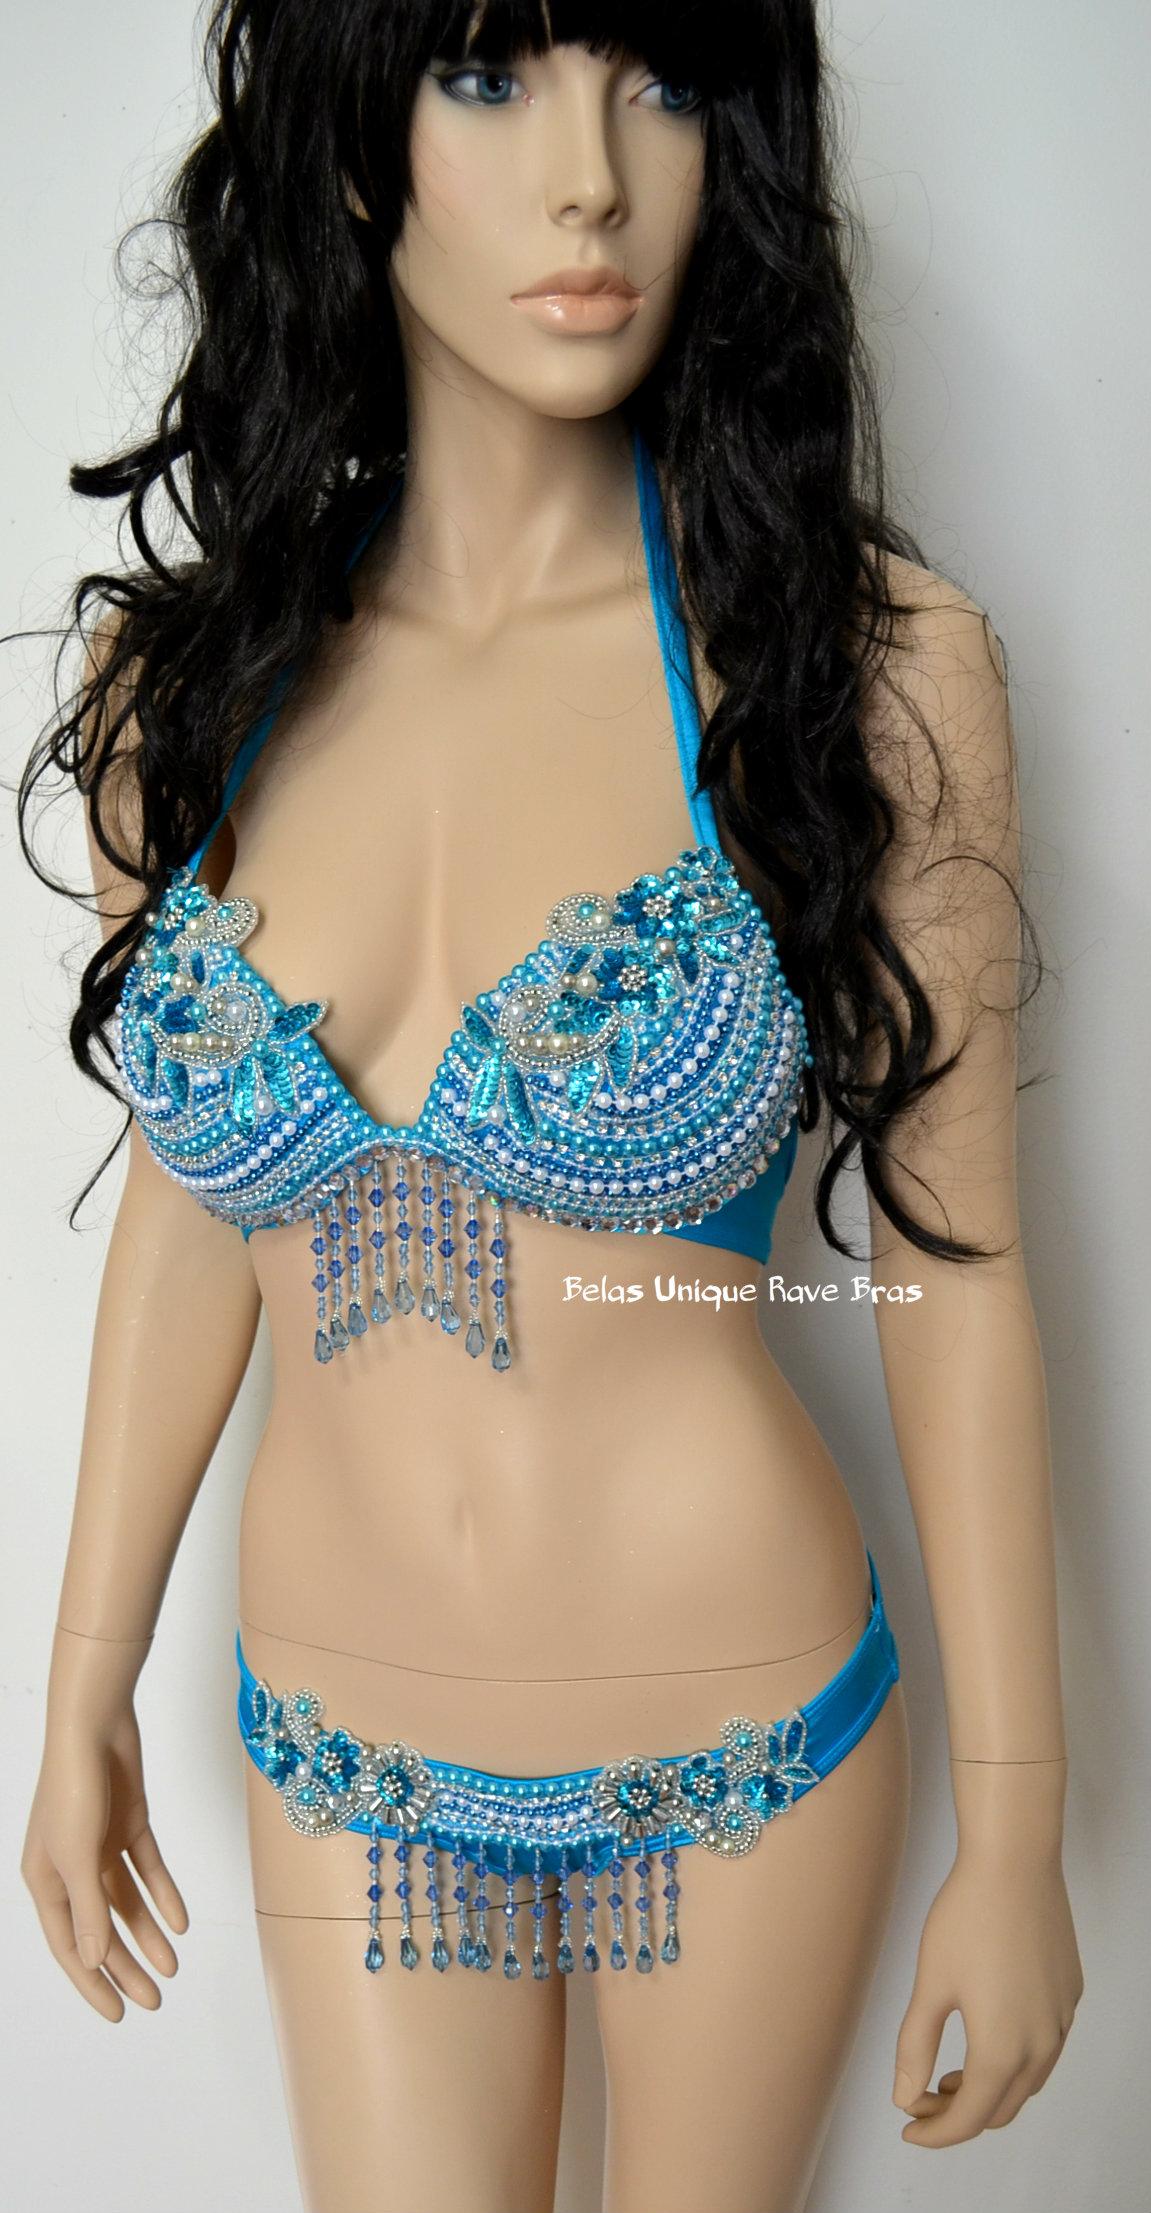 turquoise samba bikini bra bottom dance costume rave bra halloween swimsuit samba fitnessd comp thumbnail - Halloween Swimsuit